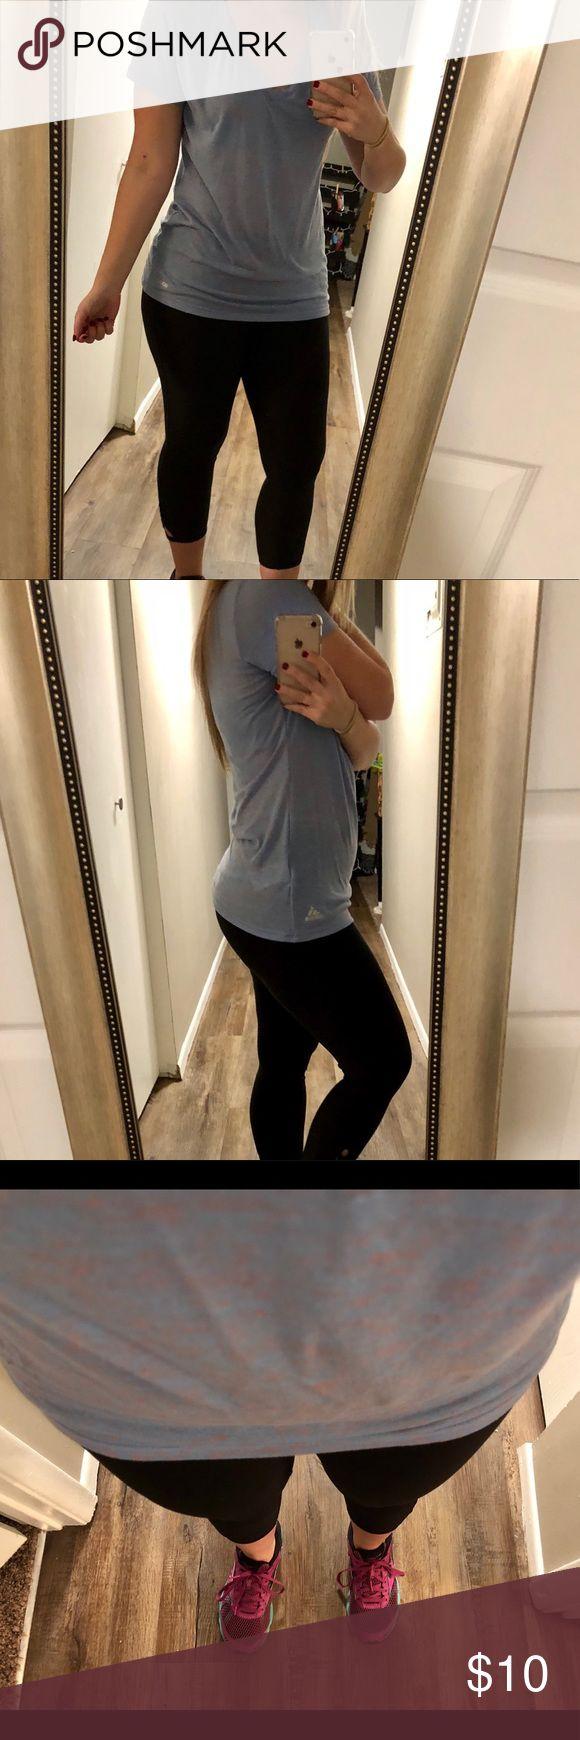 Adidas workout shirt Soooo soft, marbled purple color workout shirt! Light weight. adidas Tops Tees - Short Sleeve